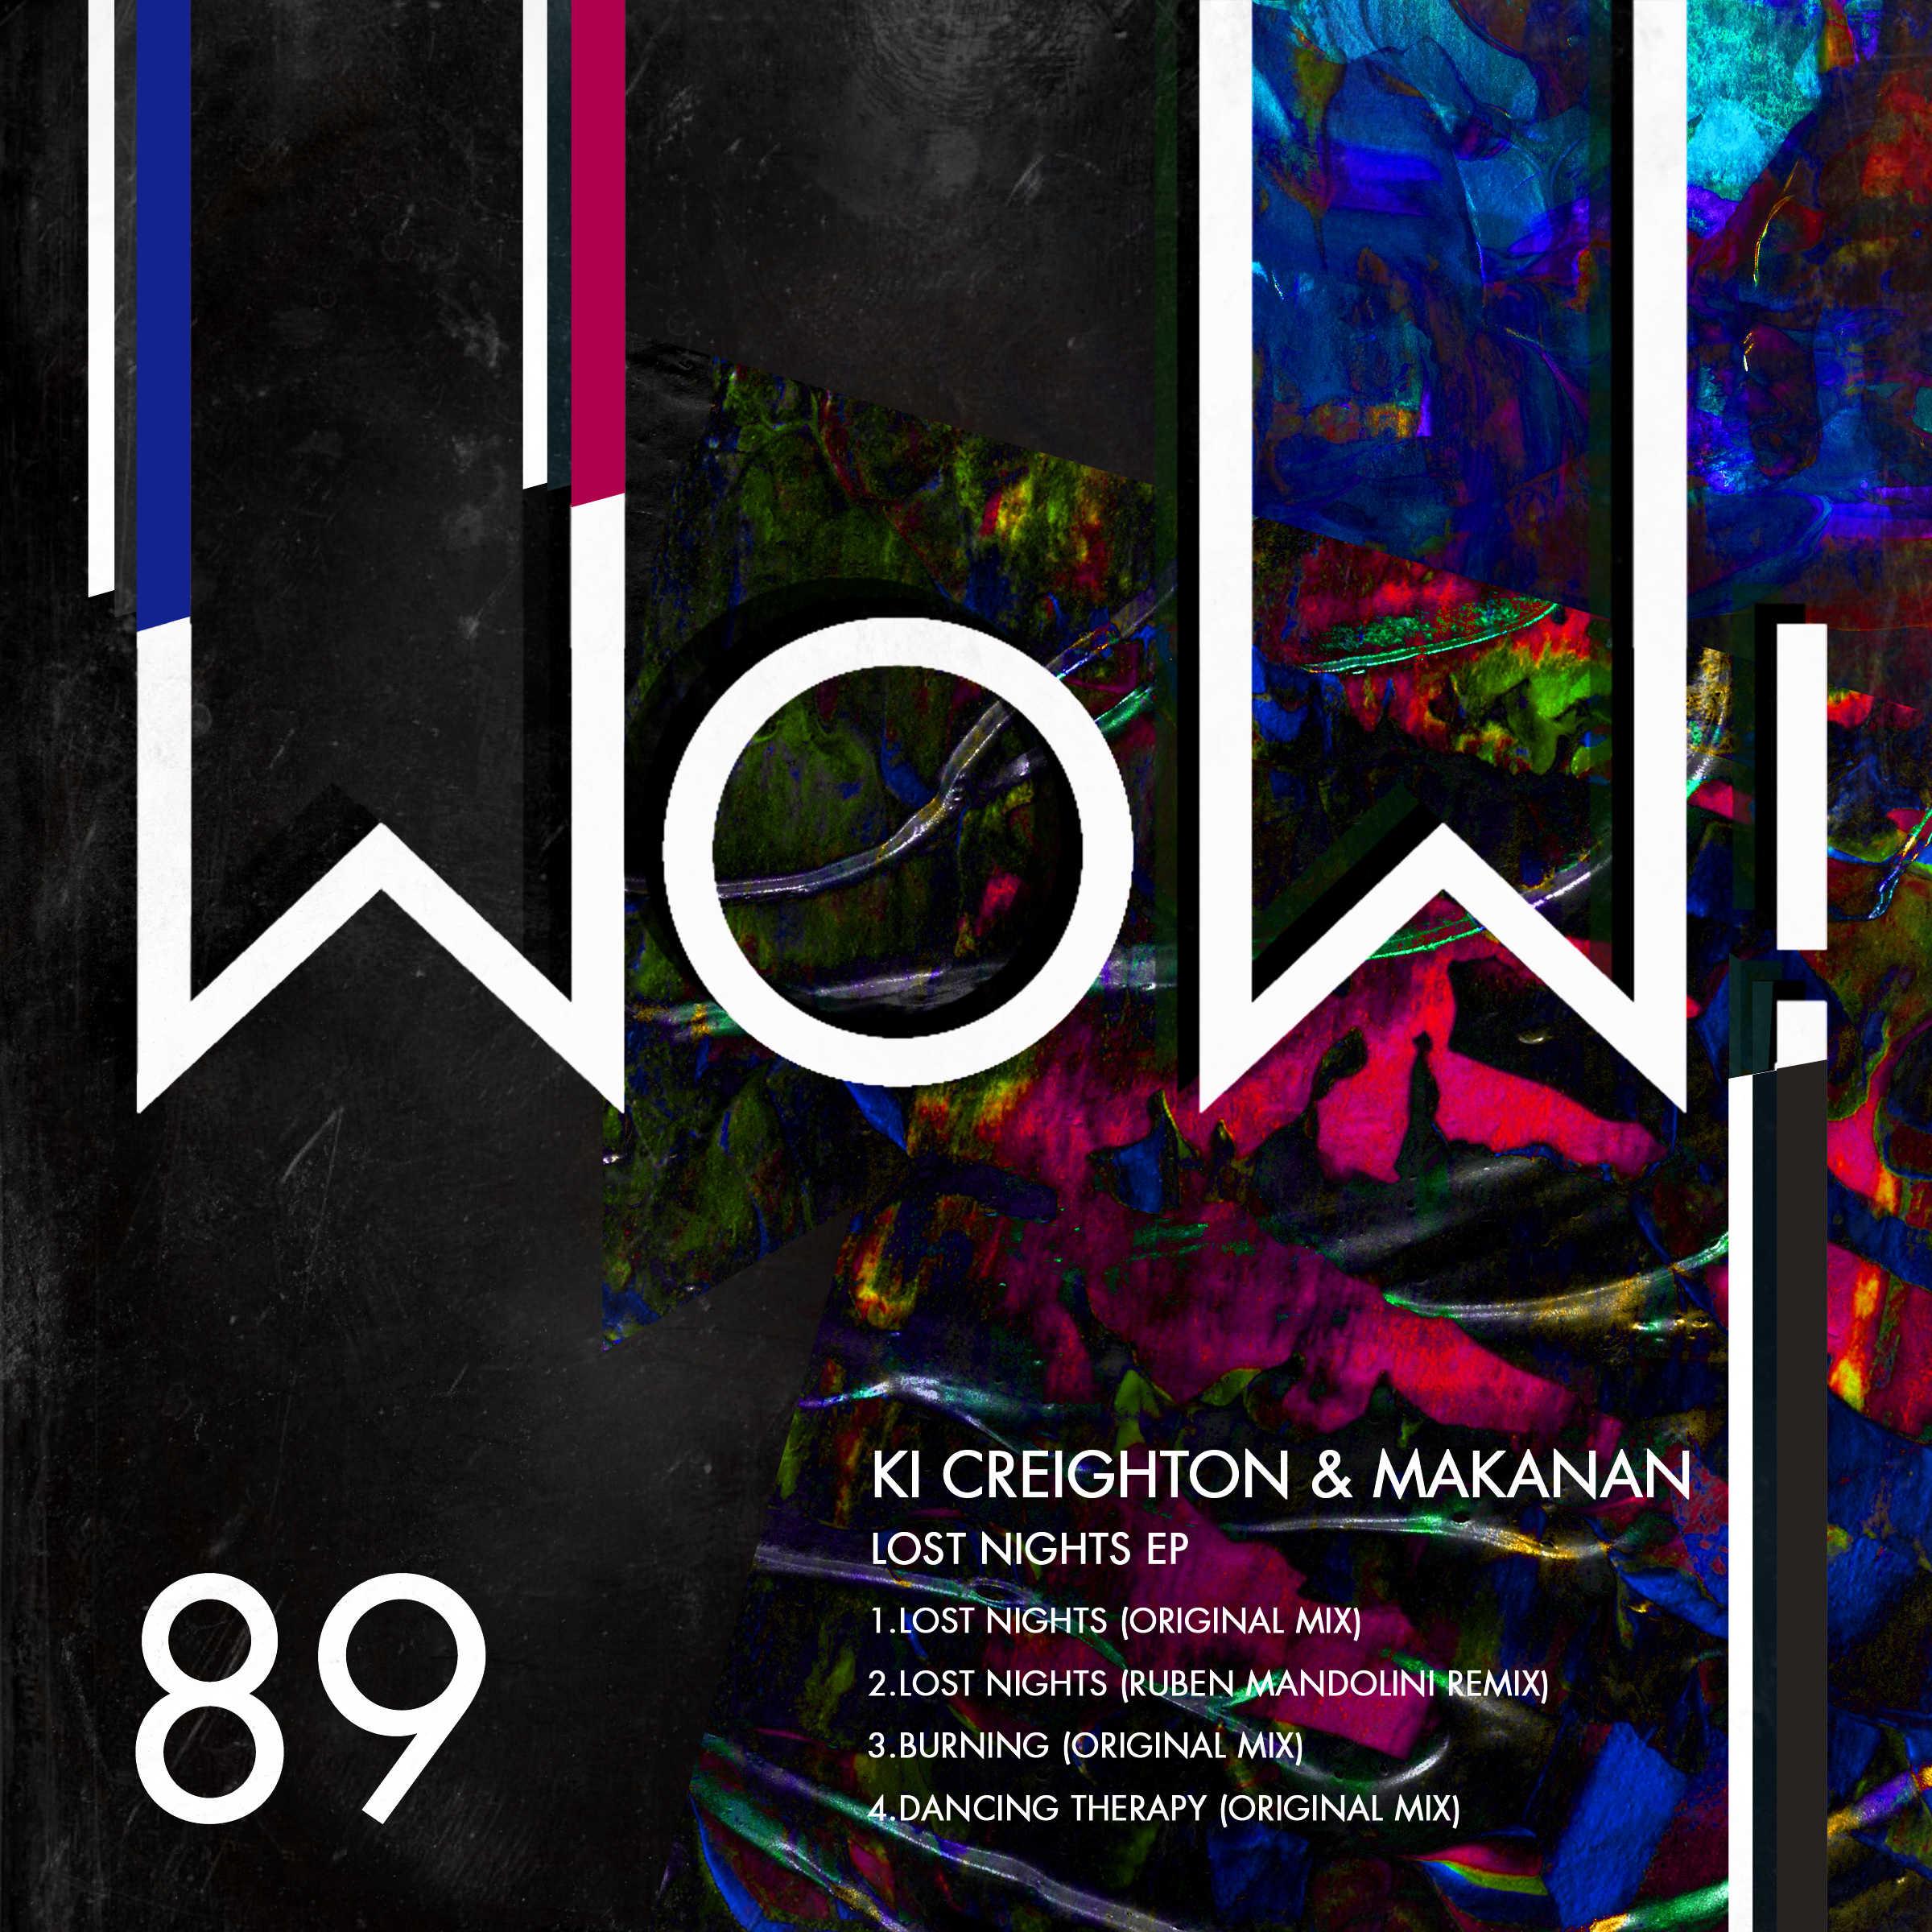 Ki Creighton & Makanan – Lost Nights (Wow! Recordings)